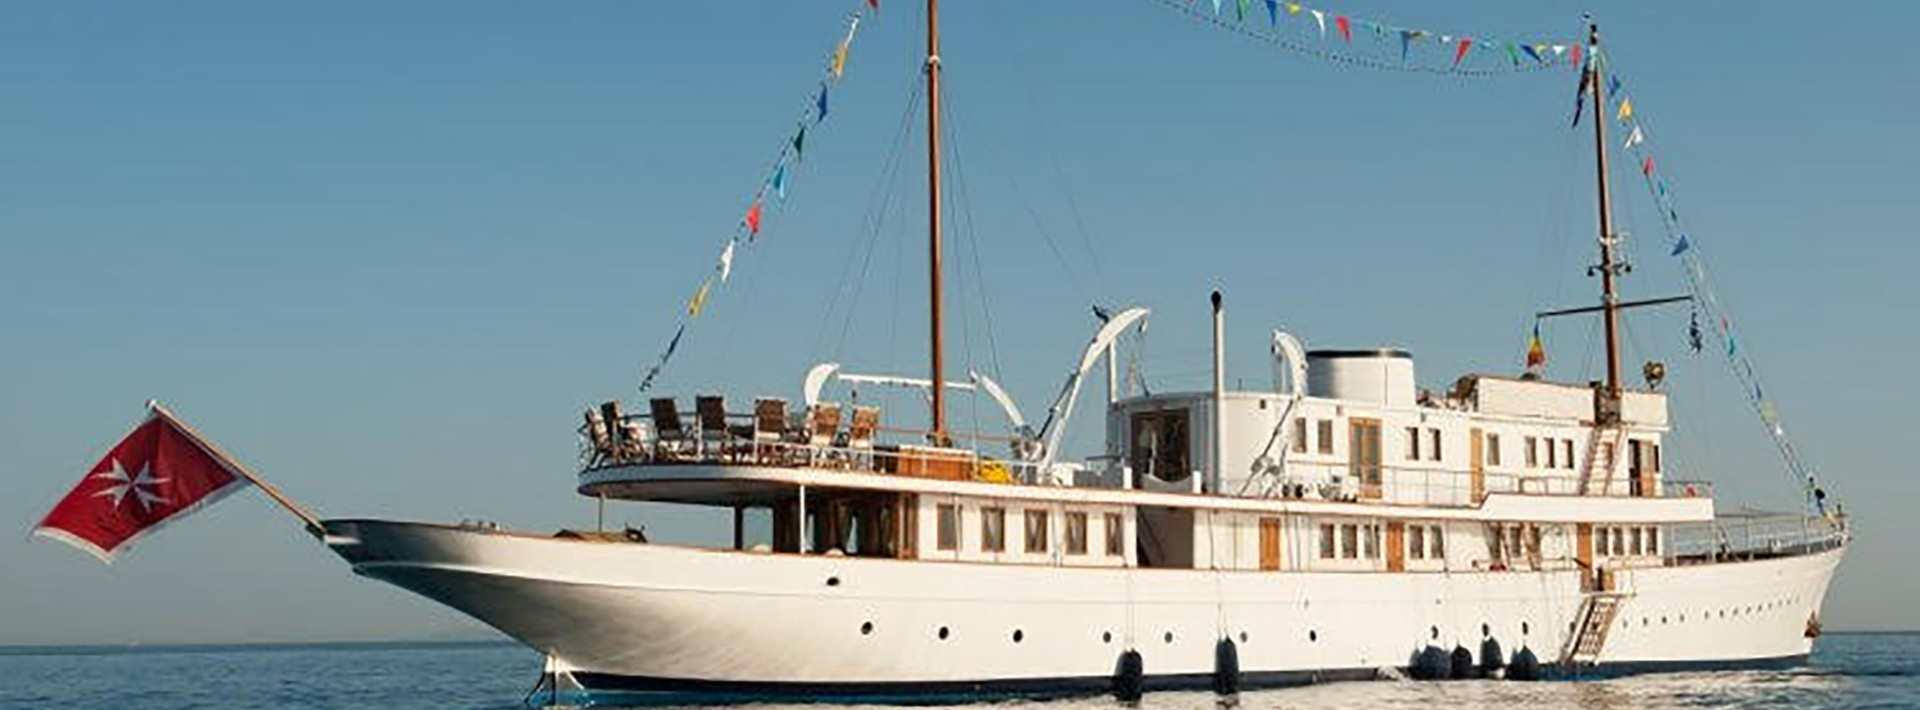 Madiz : Ένα Ιστορικό Σκάφος, Κωνσταντίνος Κελετσέκης, Έλληνας της Διασποράς, motor yacht, keletsekis, κελεκετσης,